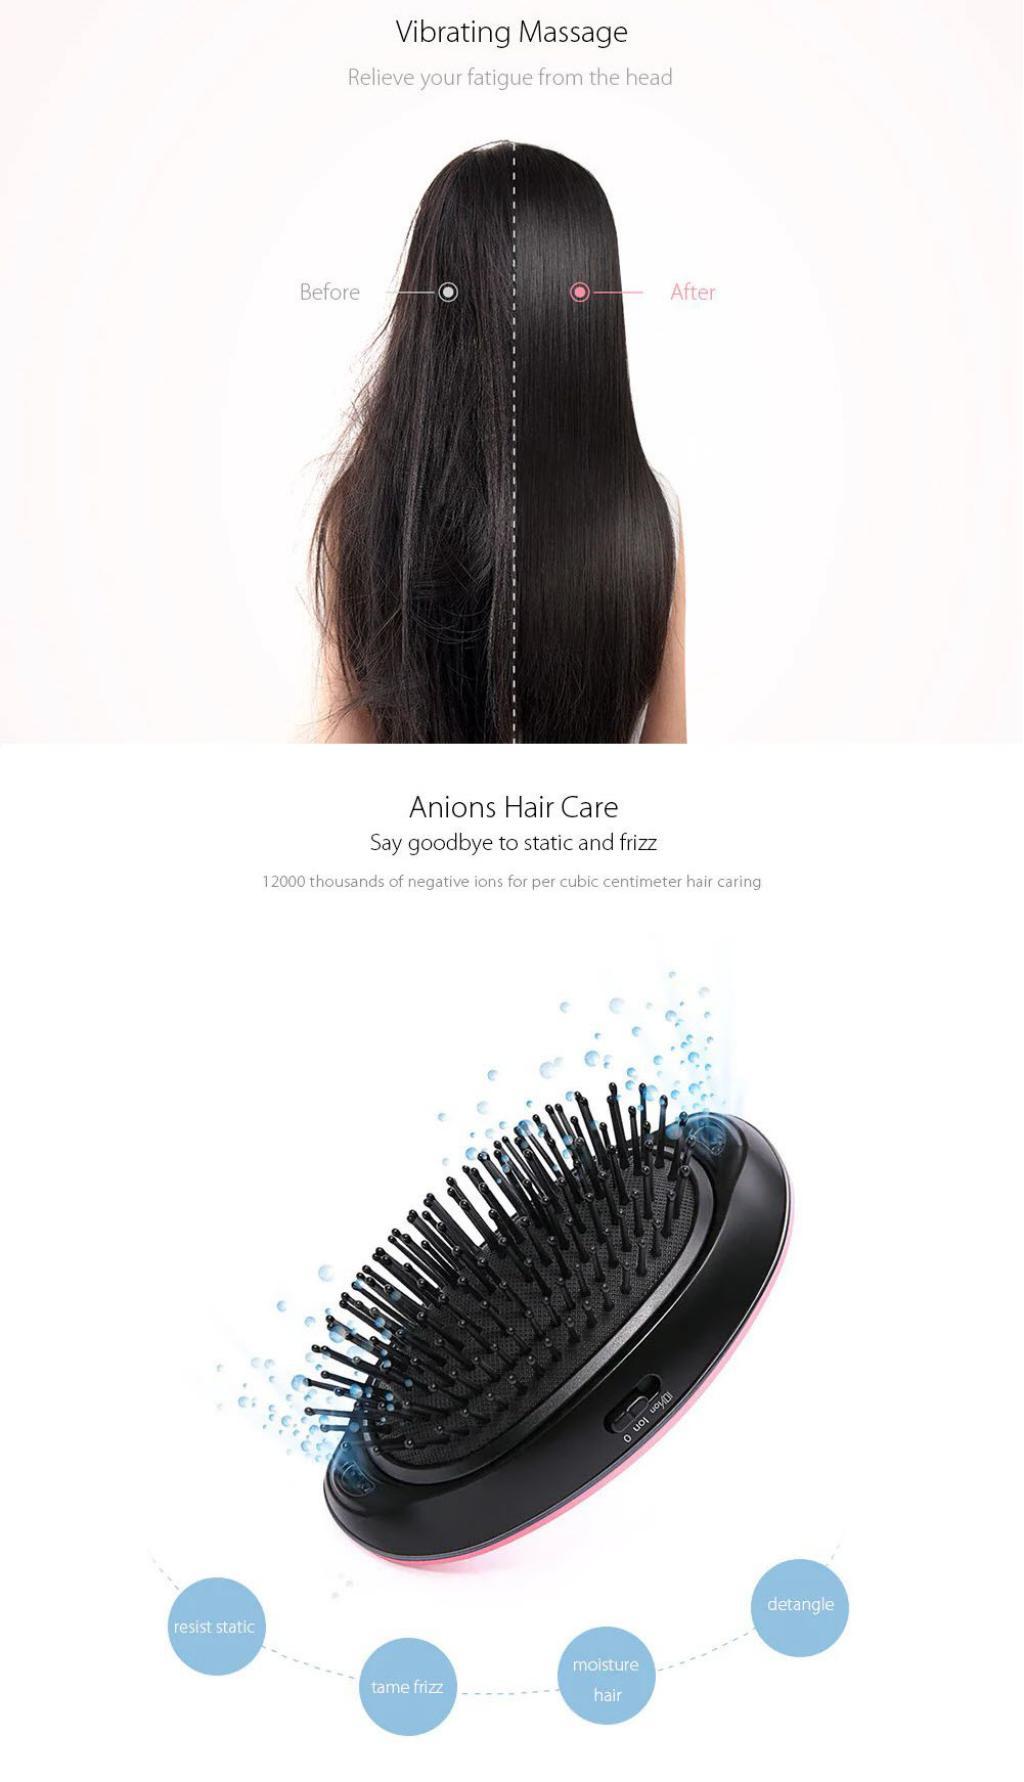 Xiaomi Mi Home Yueli Portable Anion Hair Brush (3)